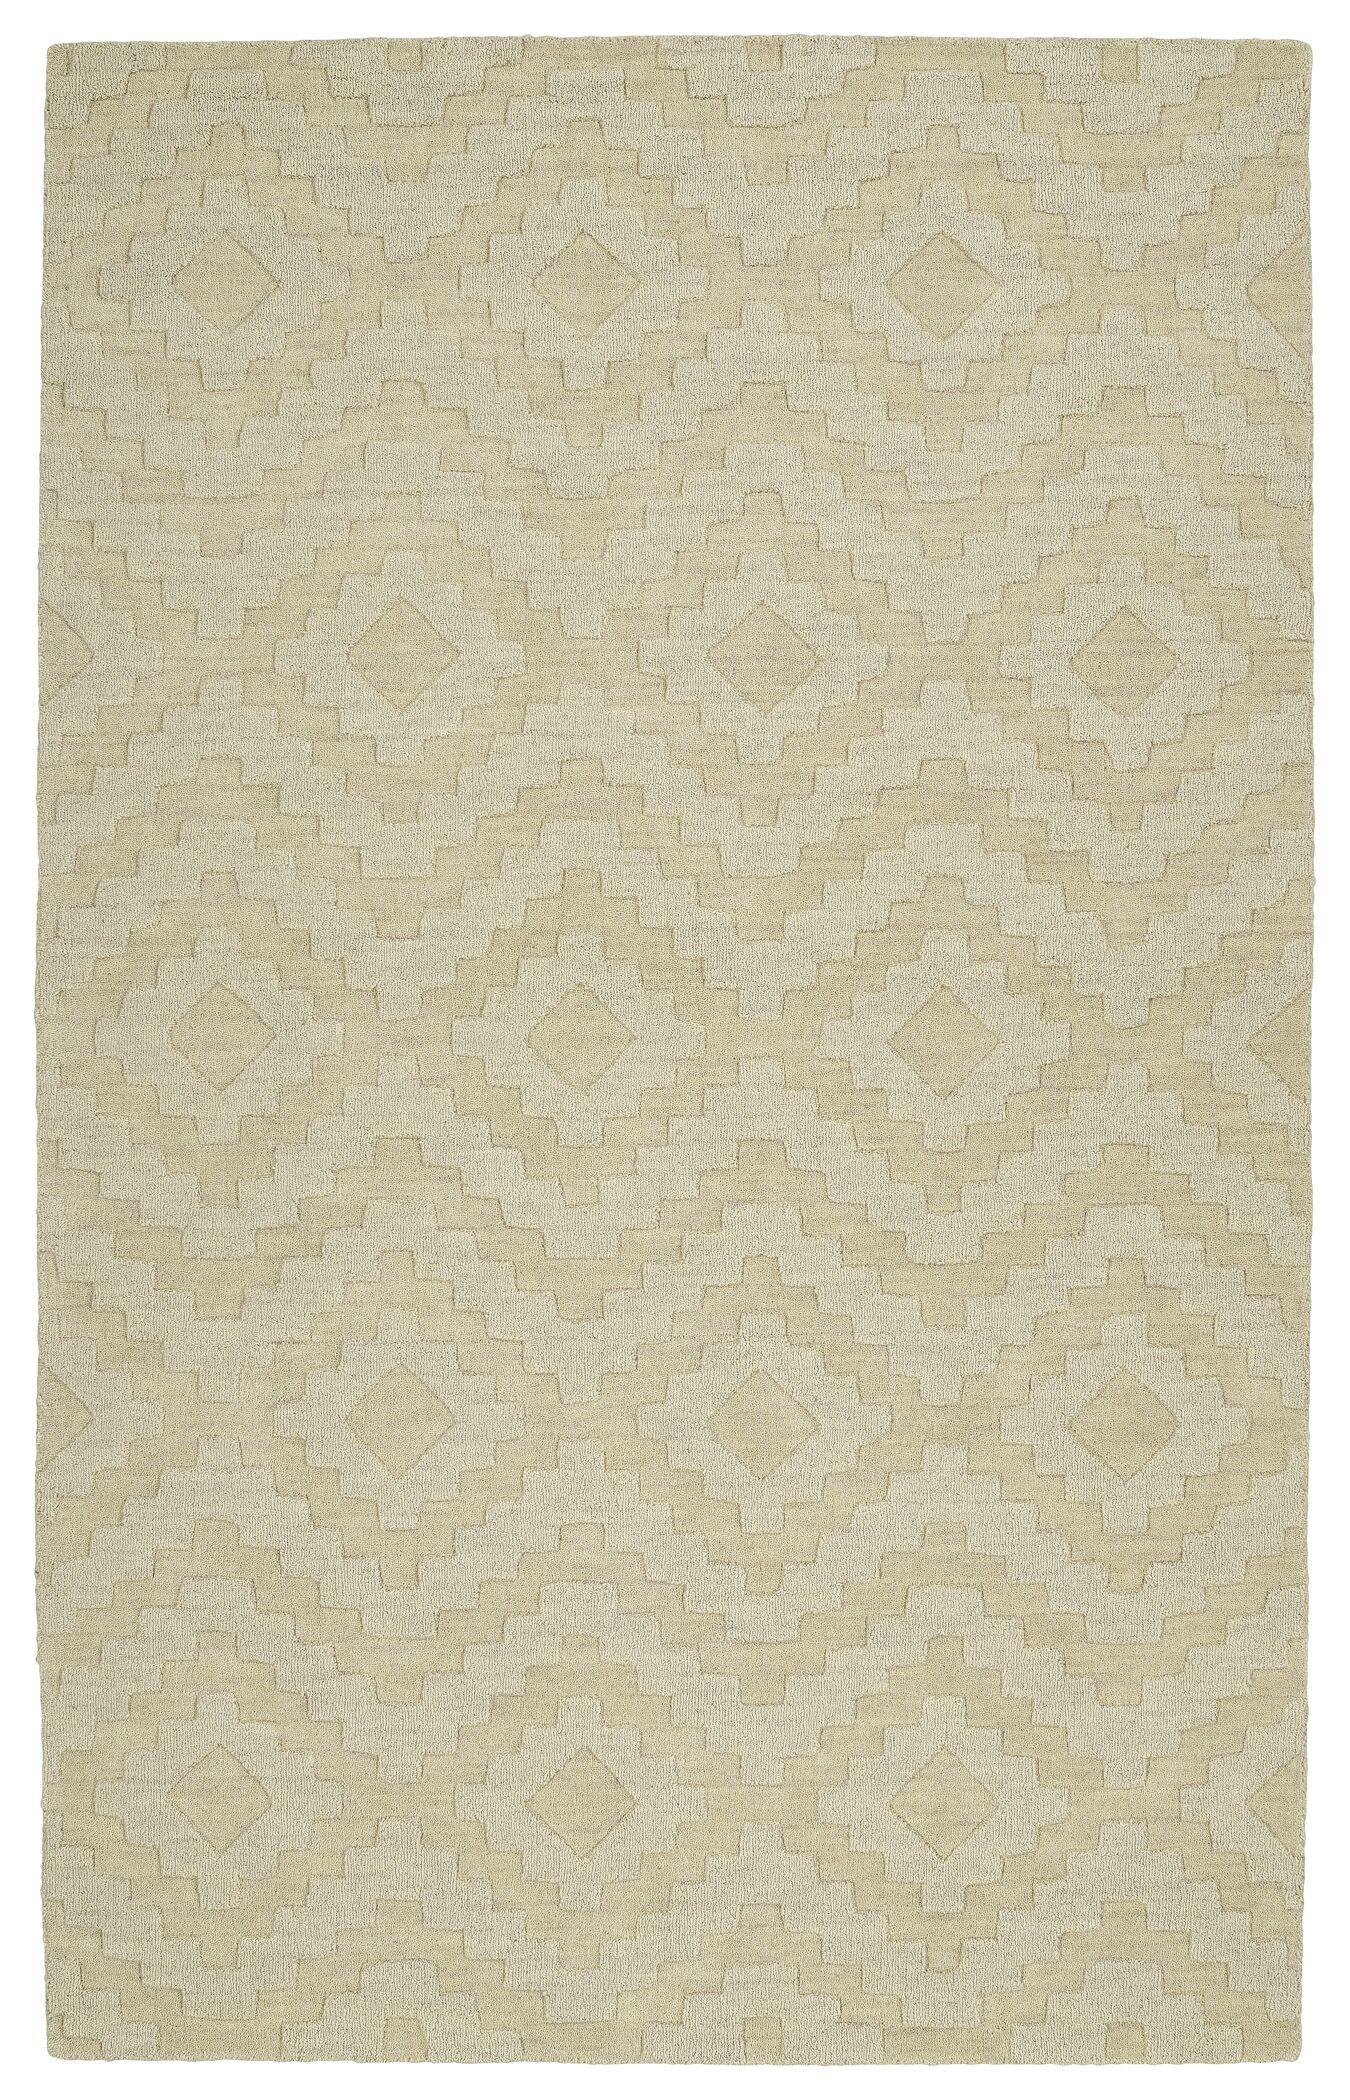 Dobson Handmade Sand Area Rug Rug Size: Rectangle 9'6